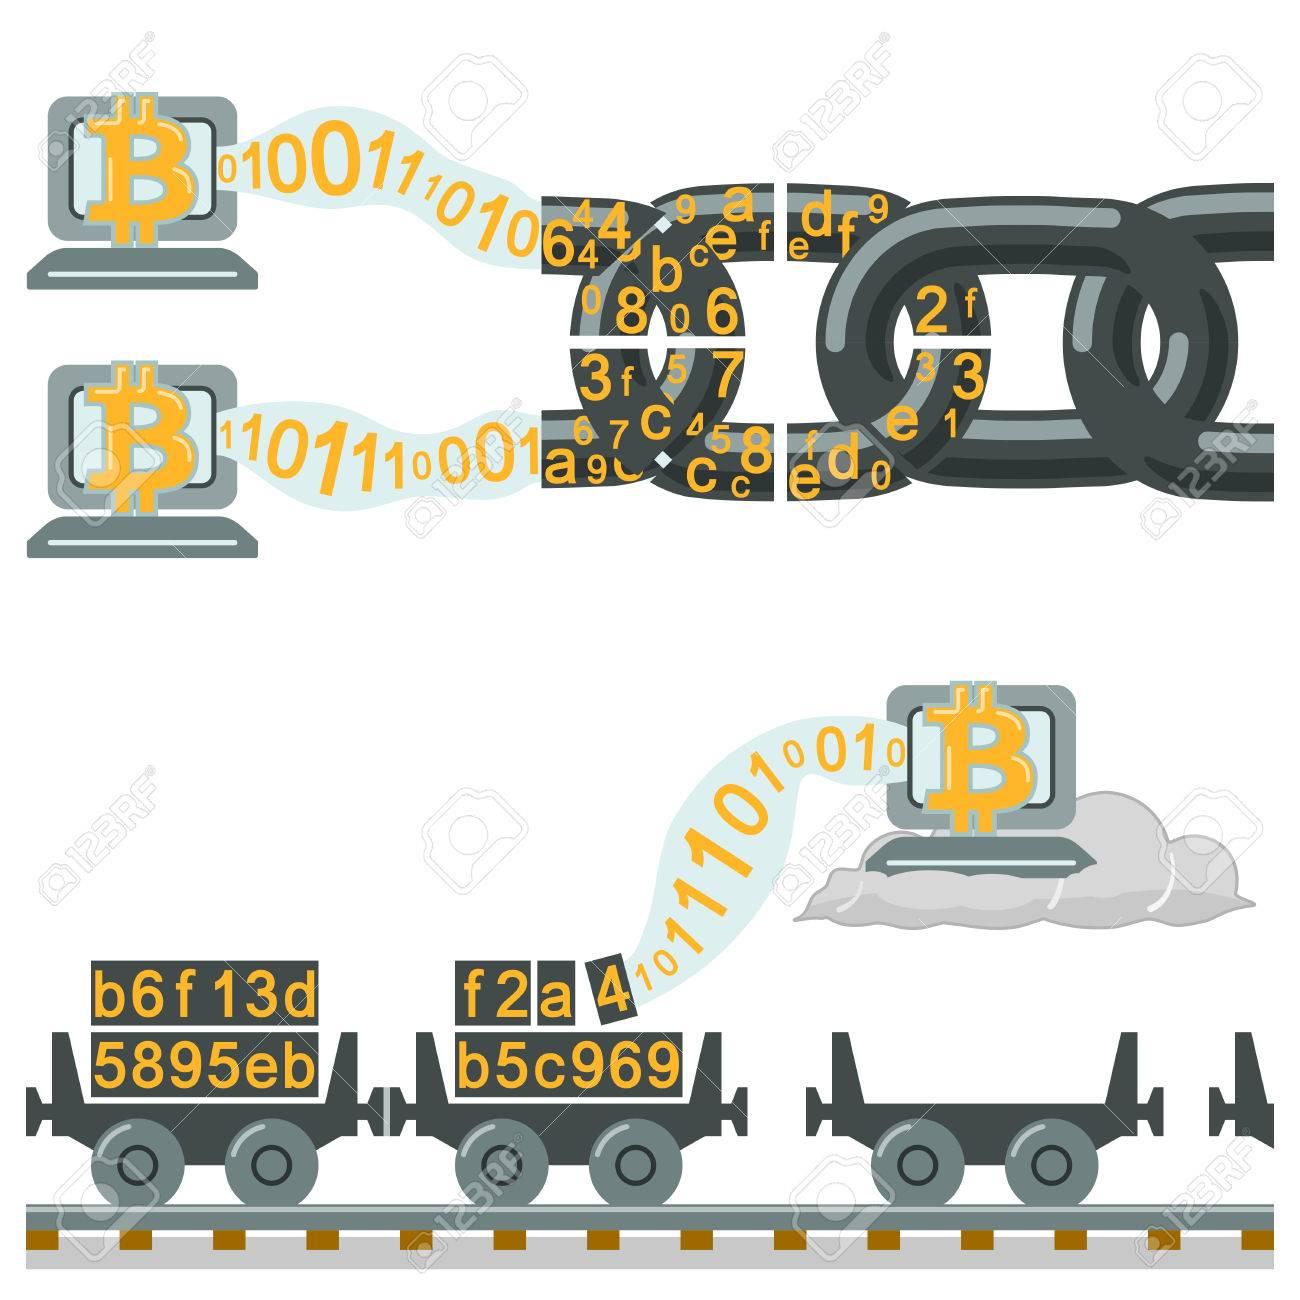 Blockchain technology as chain or railway wagons - 58705469